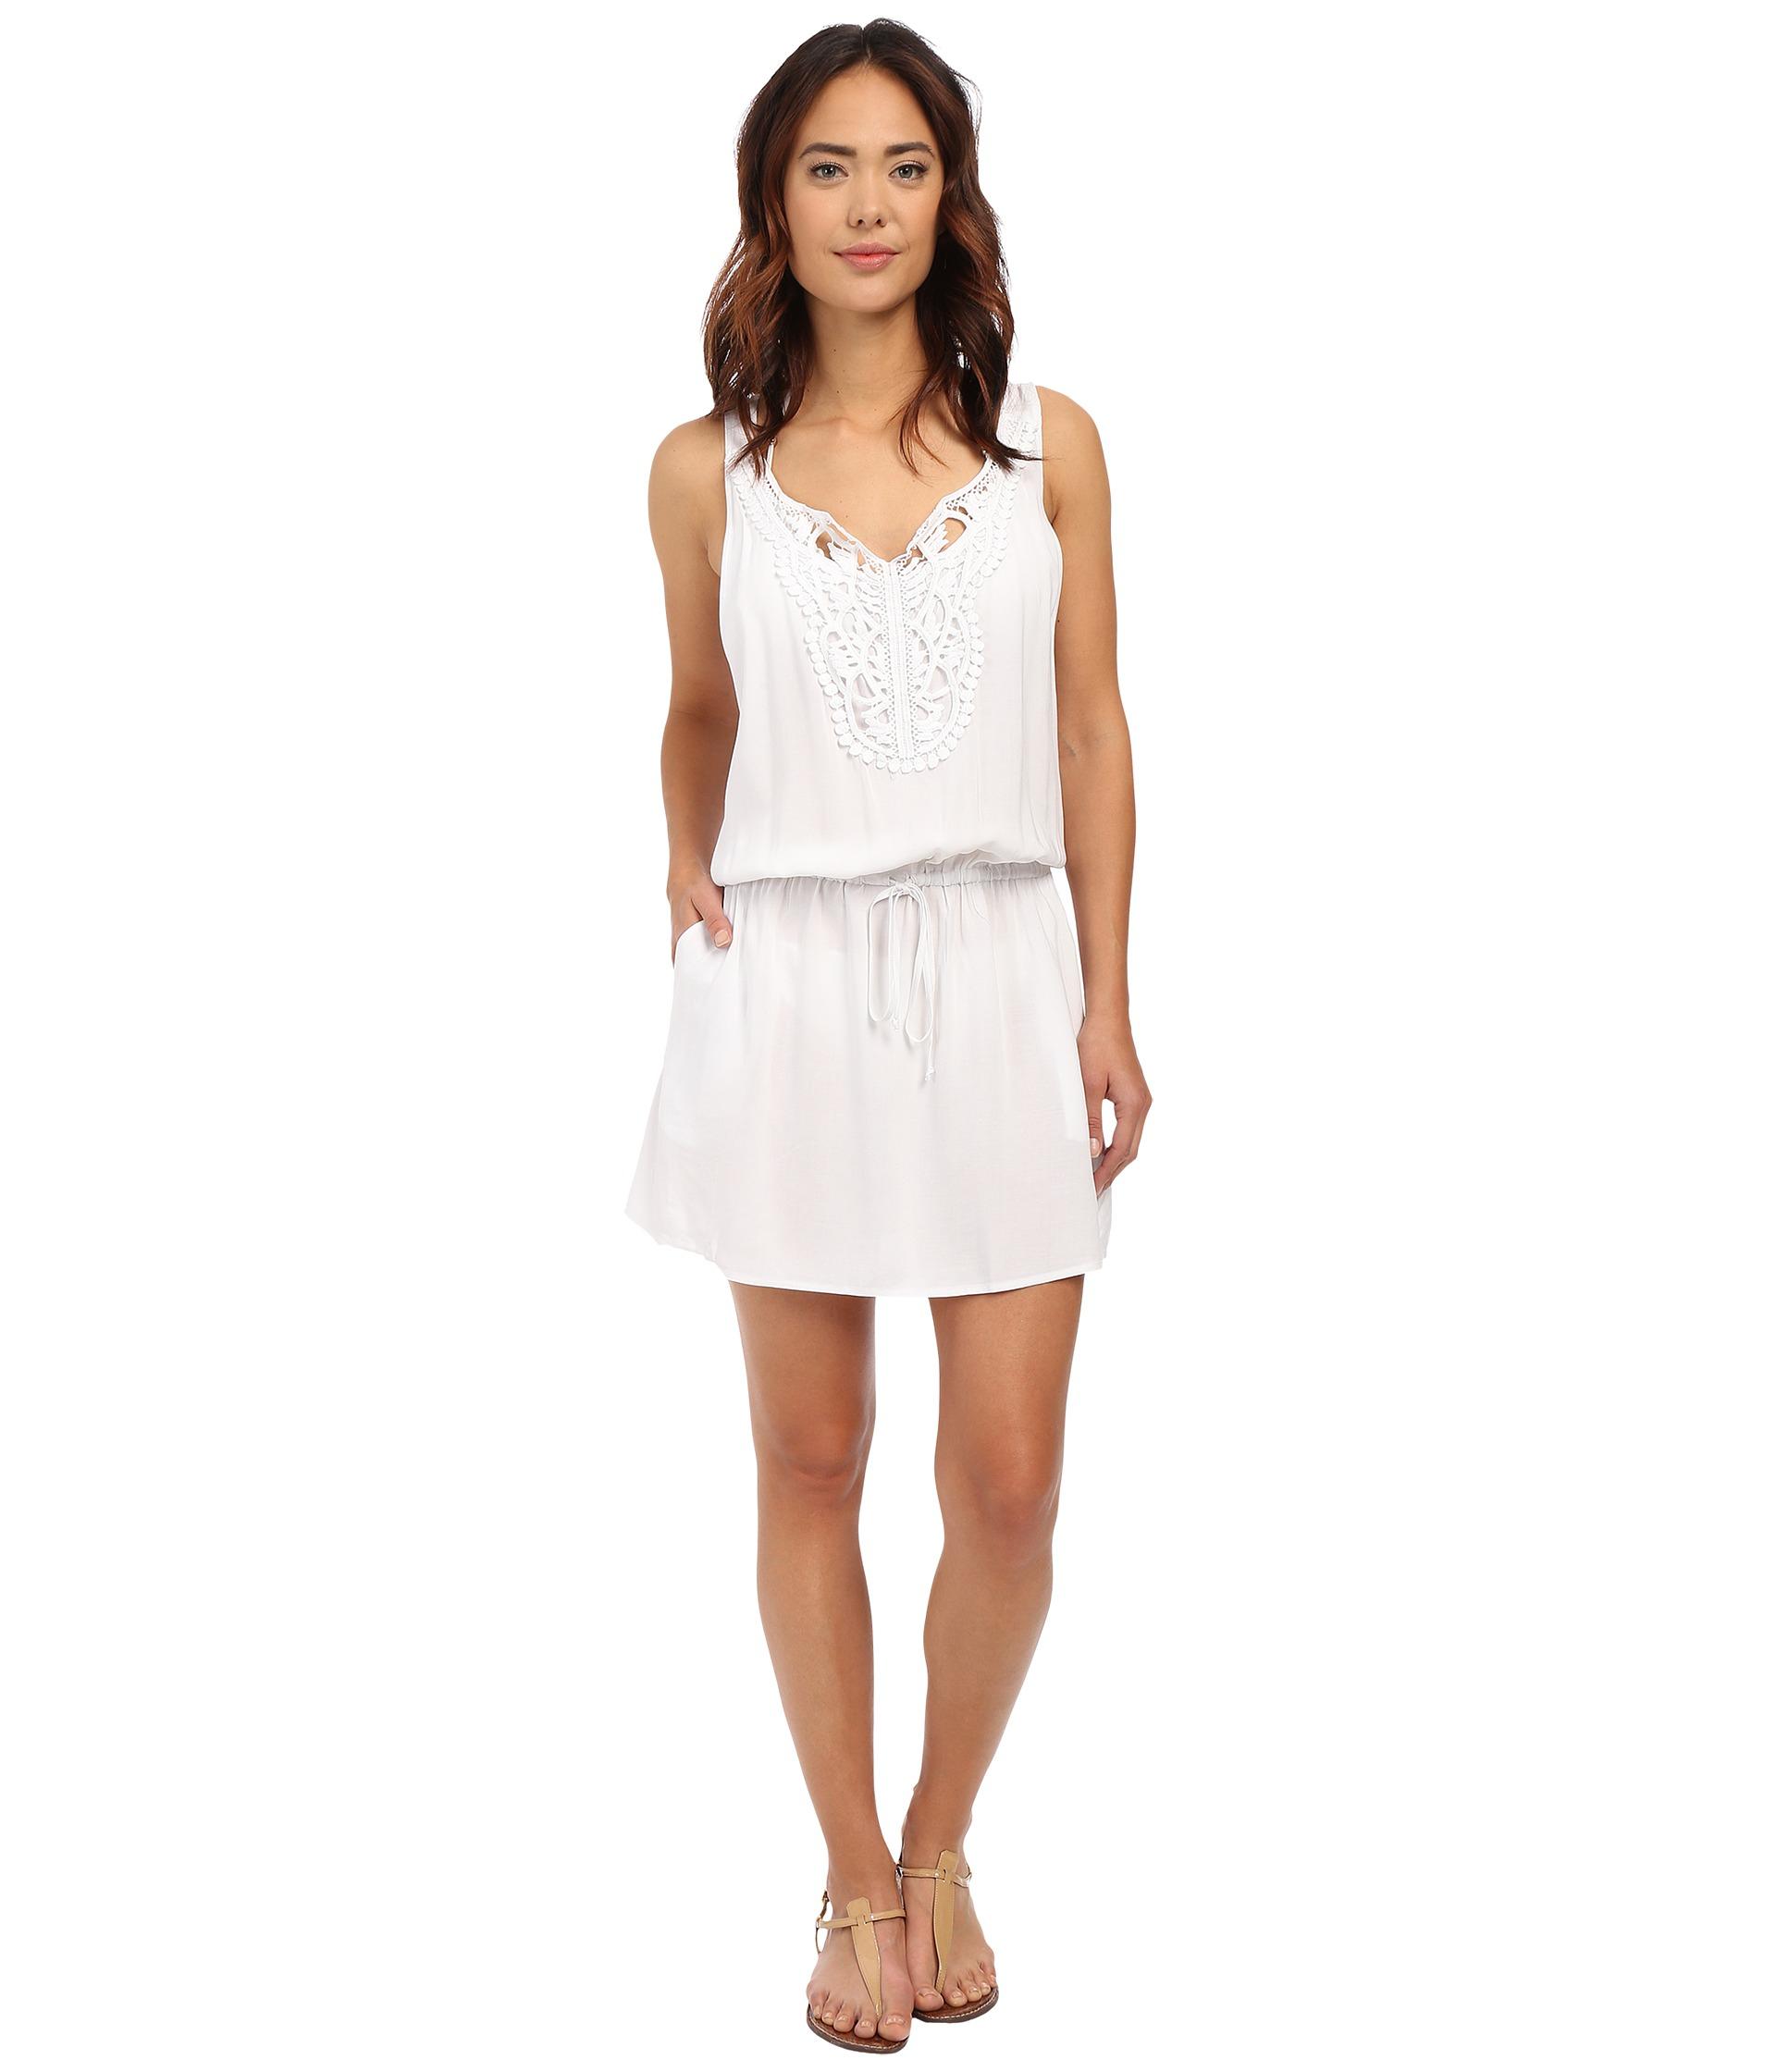 82c9ecd6d8f2a Body Glove Rosie Cover-up Dress in White - Lyst